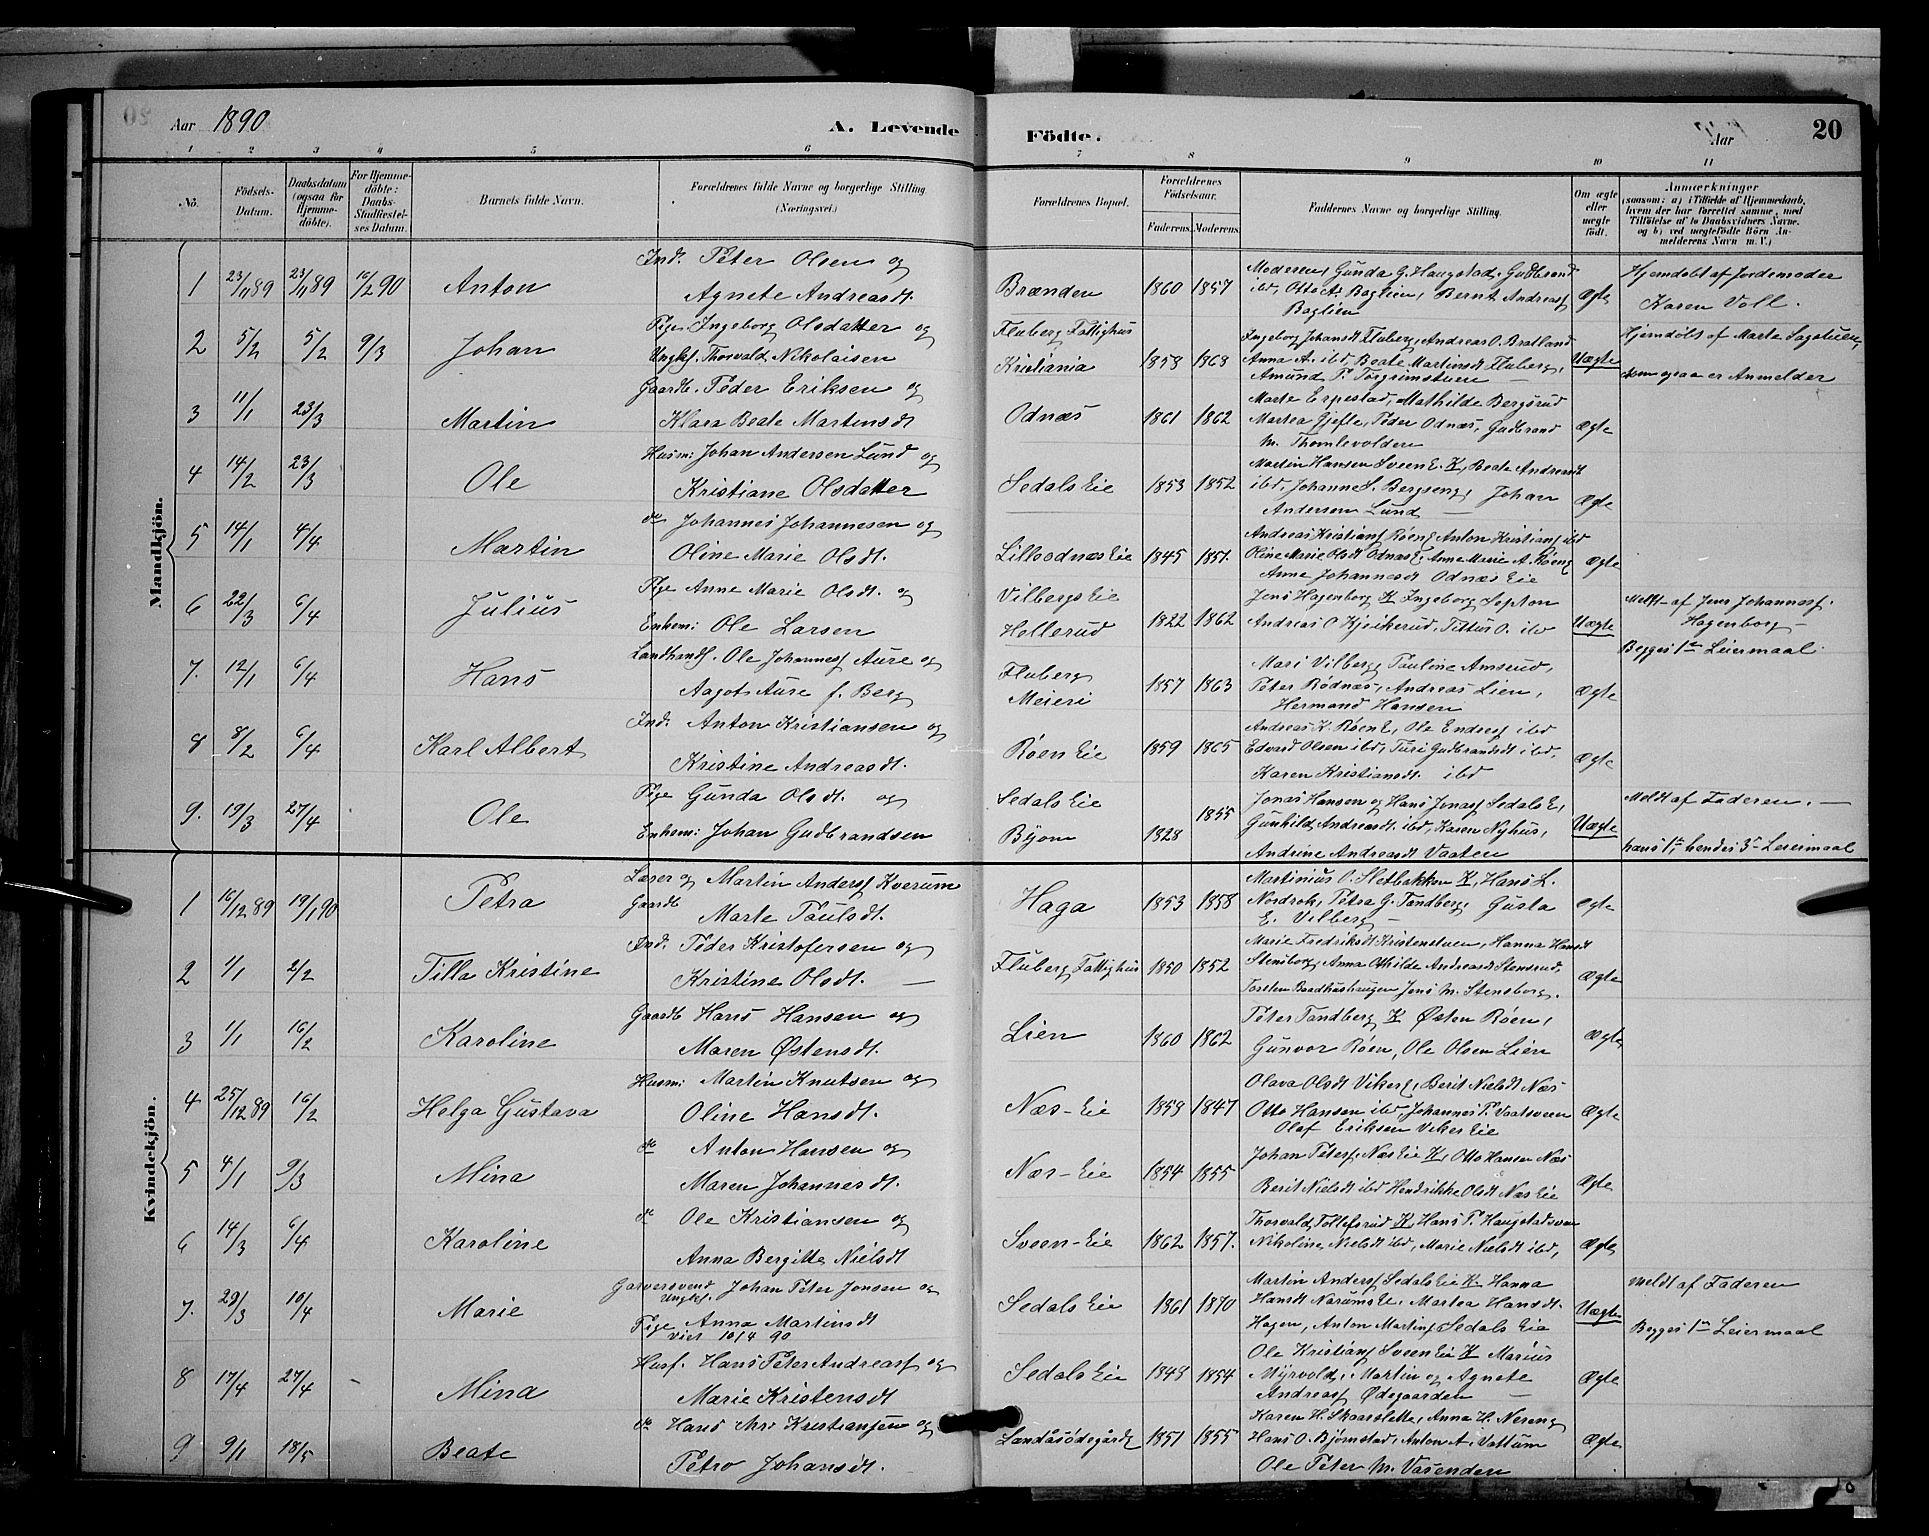 SAH, Søndre Land prestekontor, L/L0003: Klokkerbok nr. 3, 1884-1902, s. 20